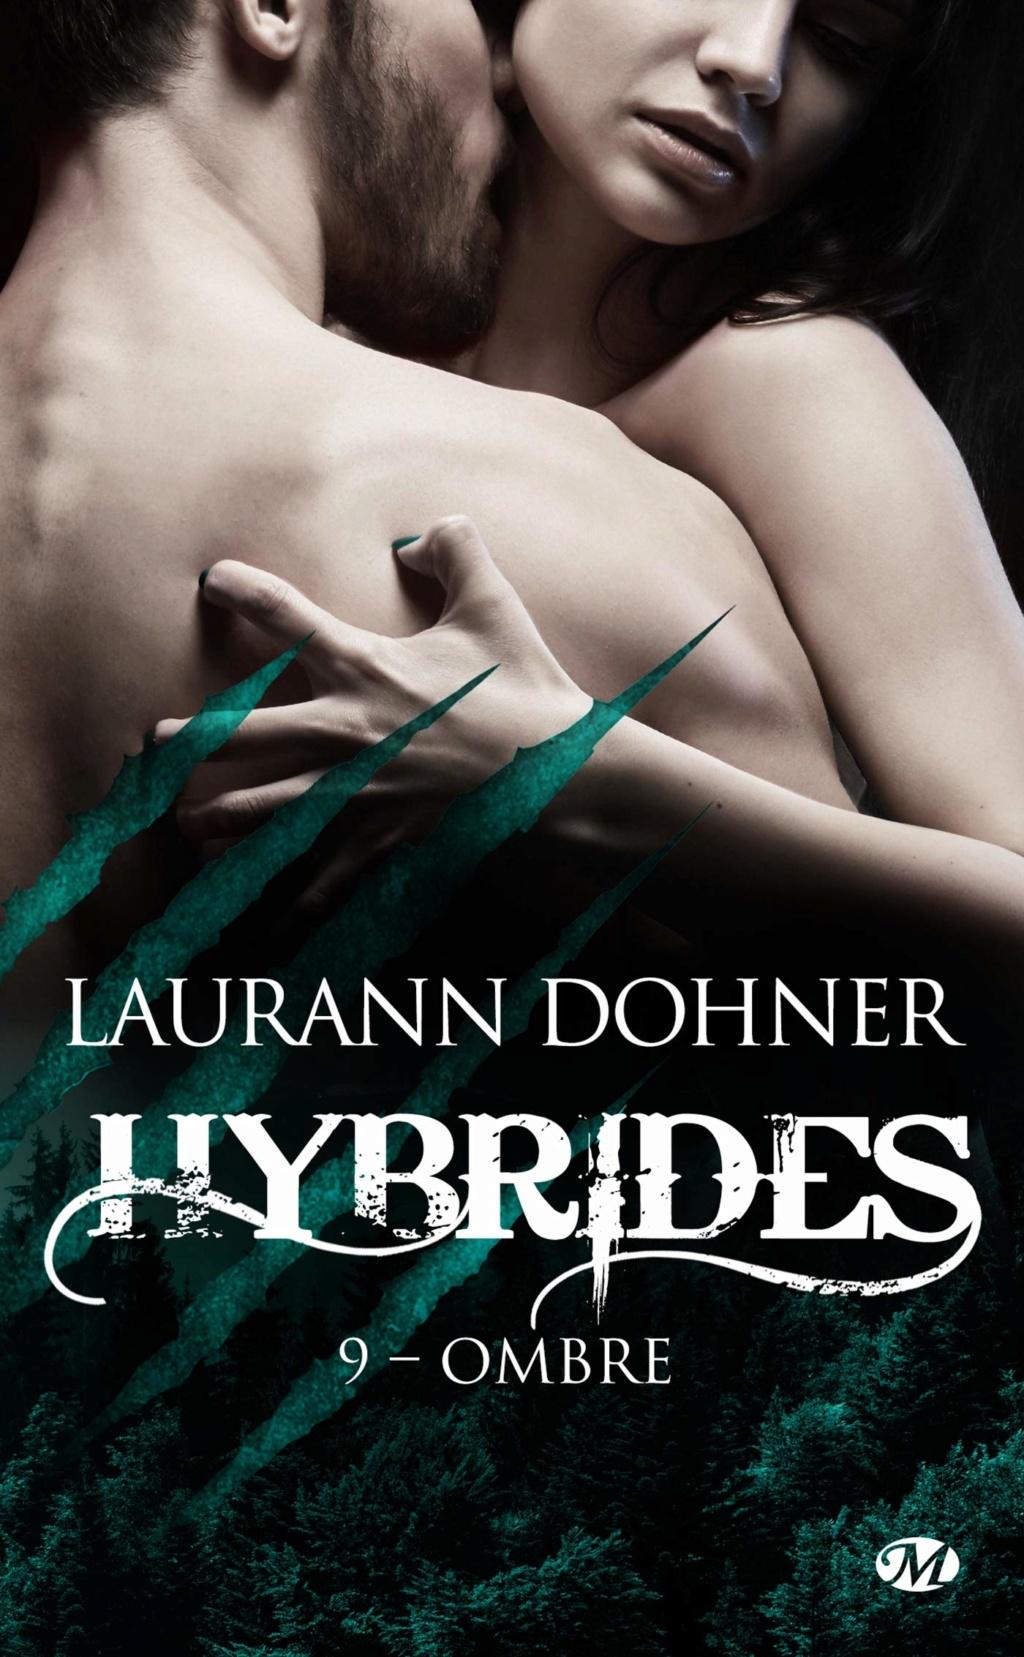 Hybrides - Tome 9 : Ombre de Laurann Dohner Hybrid10